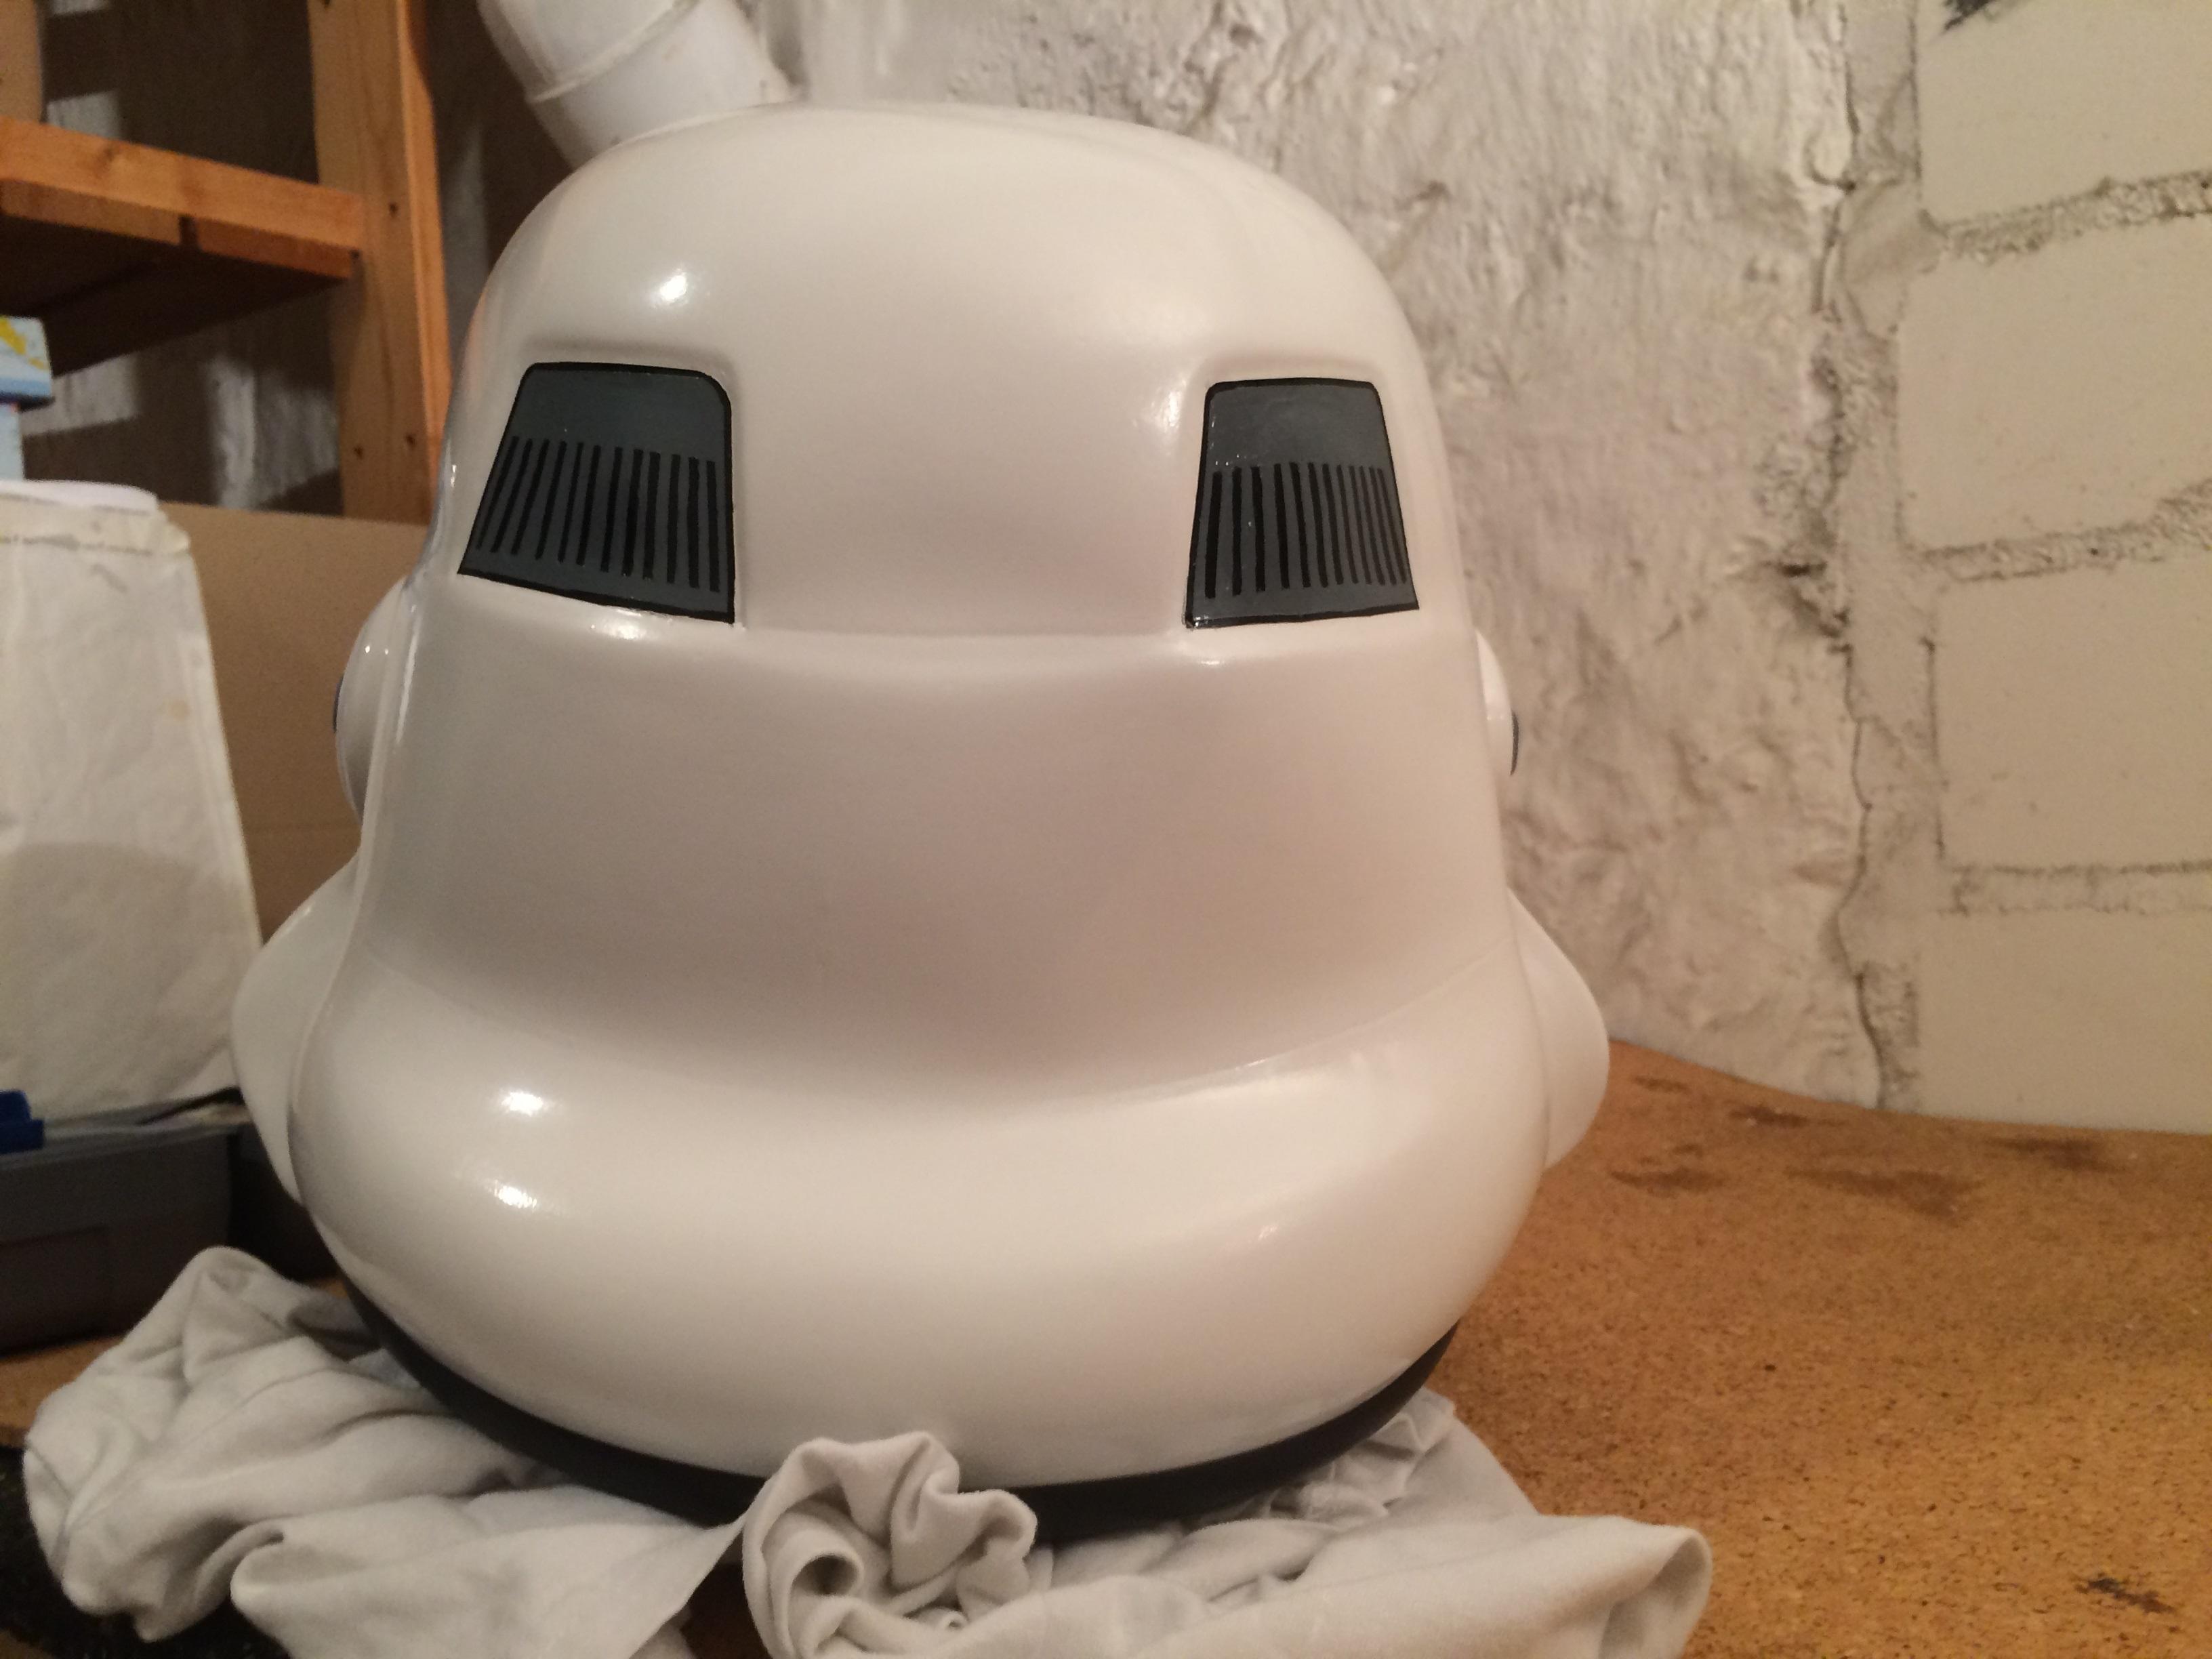 www.bartmarke.net/501st/WIP/FISD/Helmet/HDPE/17082015/IMG_4090.JPG